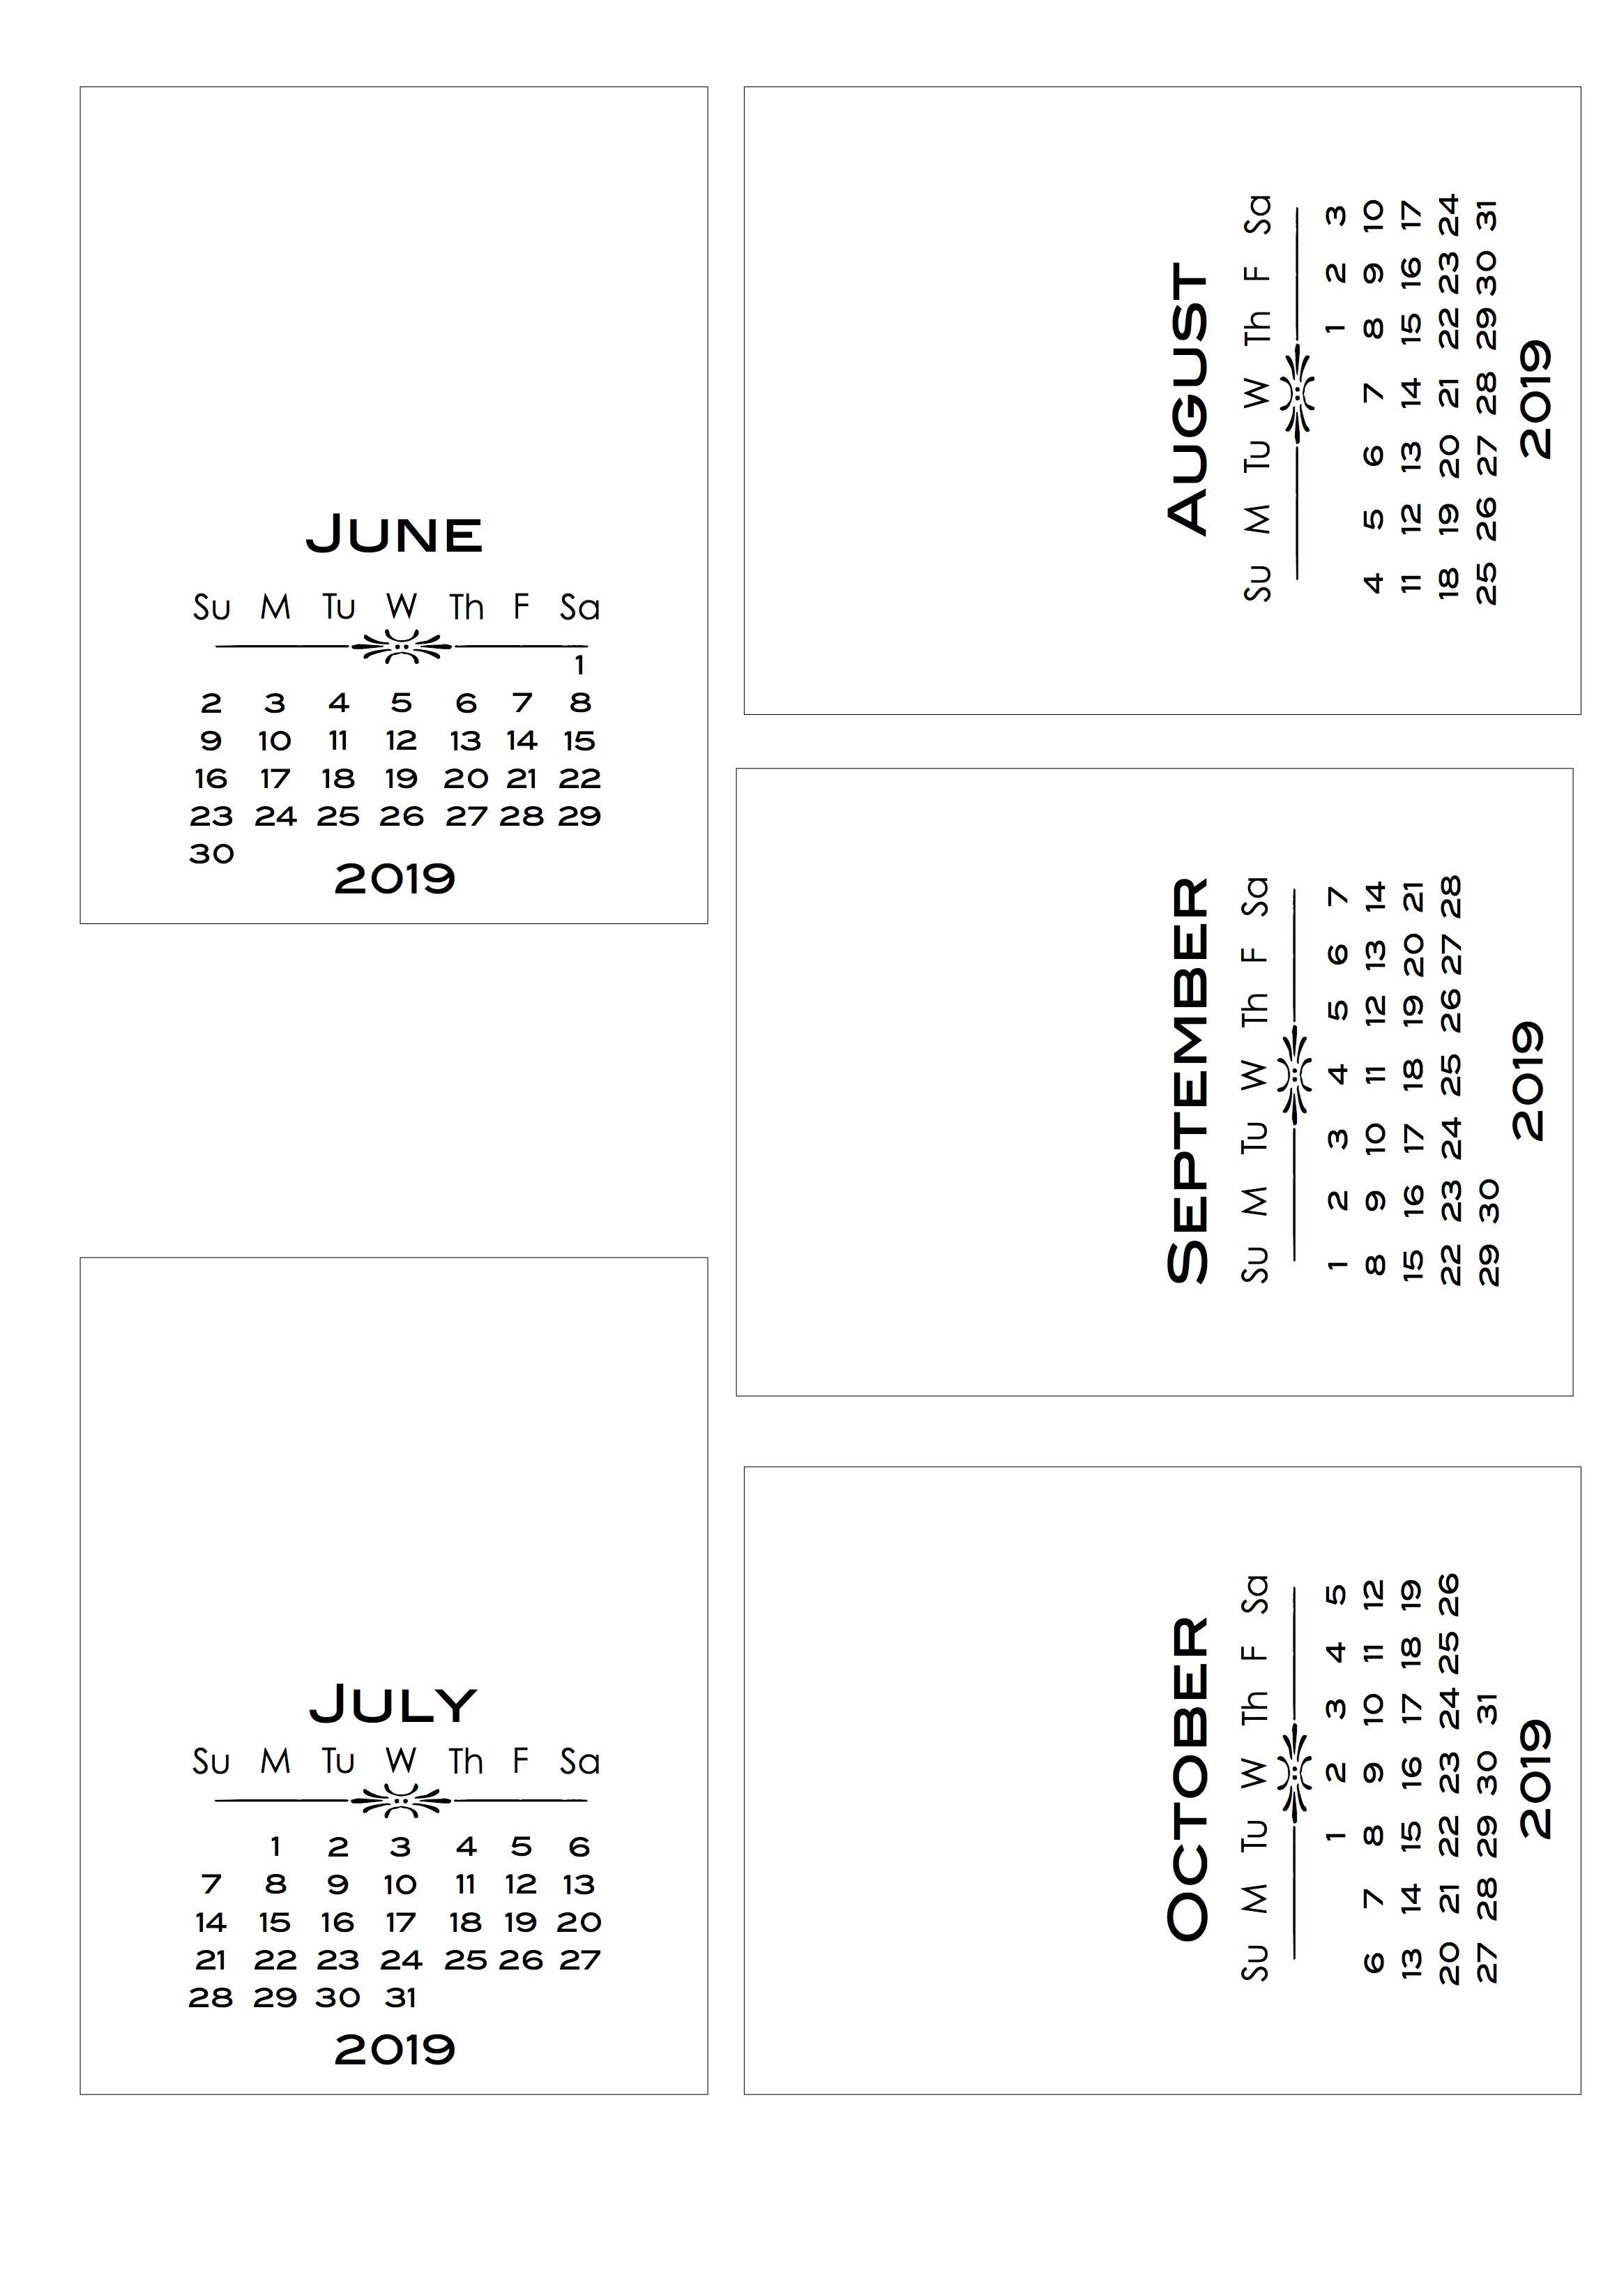 2019 Diy Calendar With Bold Text Pl Style Cards   Calendar   Diy Calendar 2019 Diy